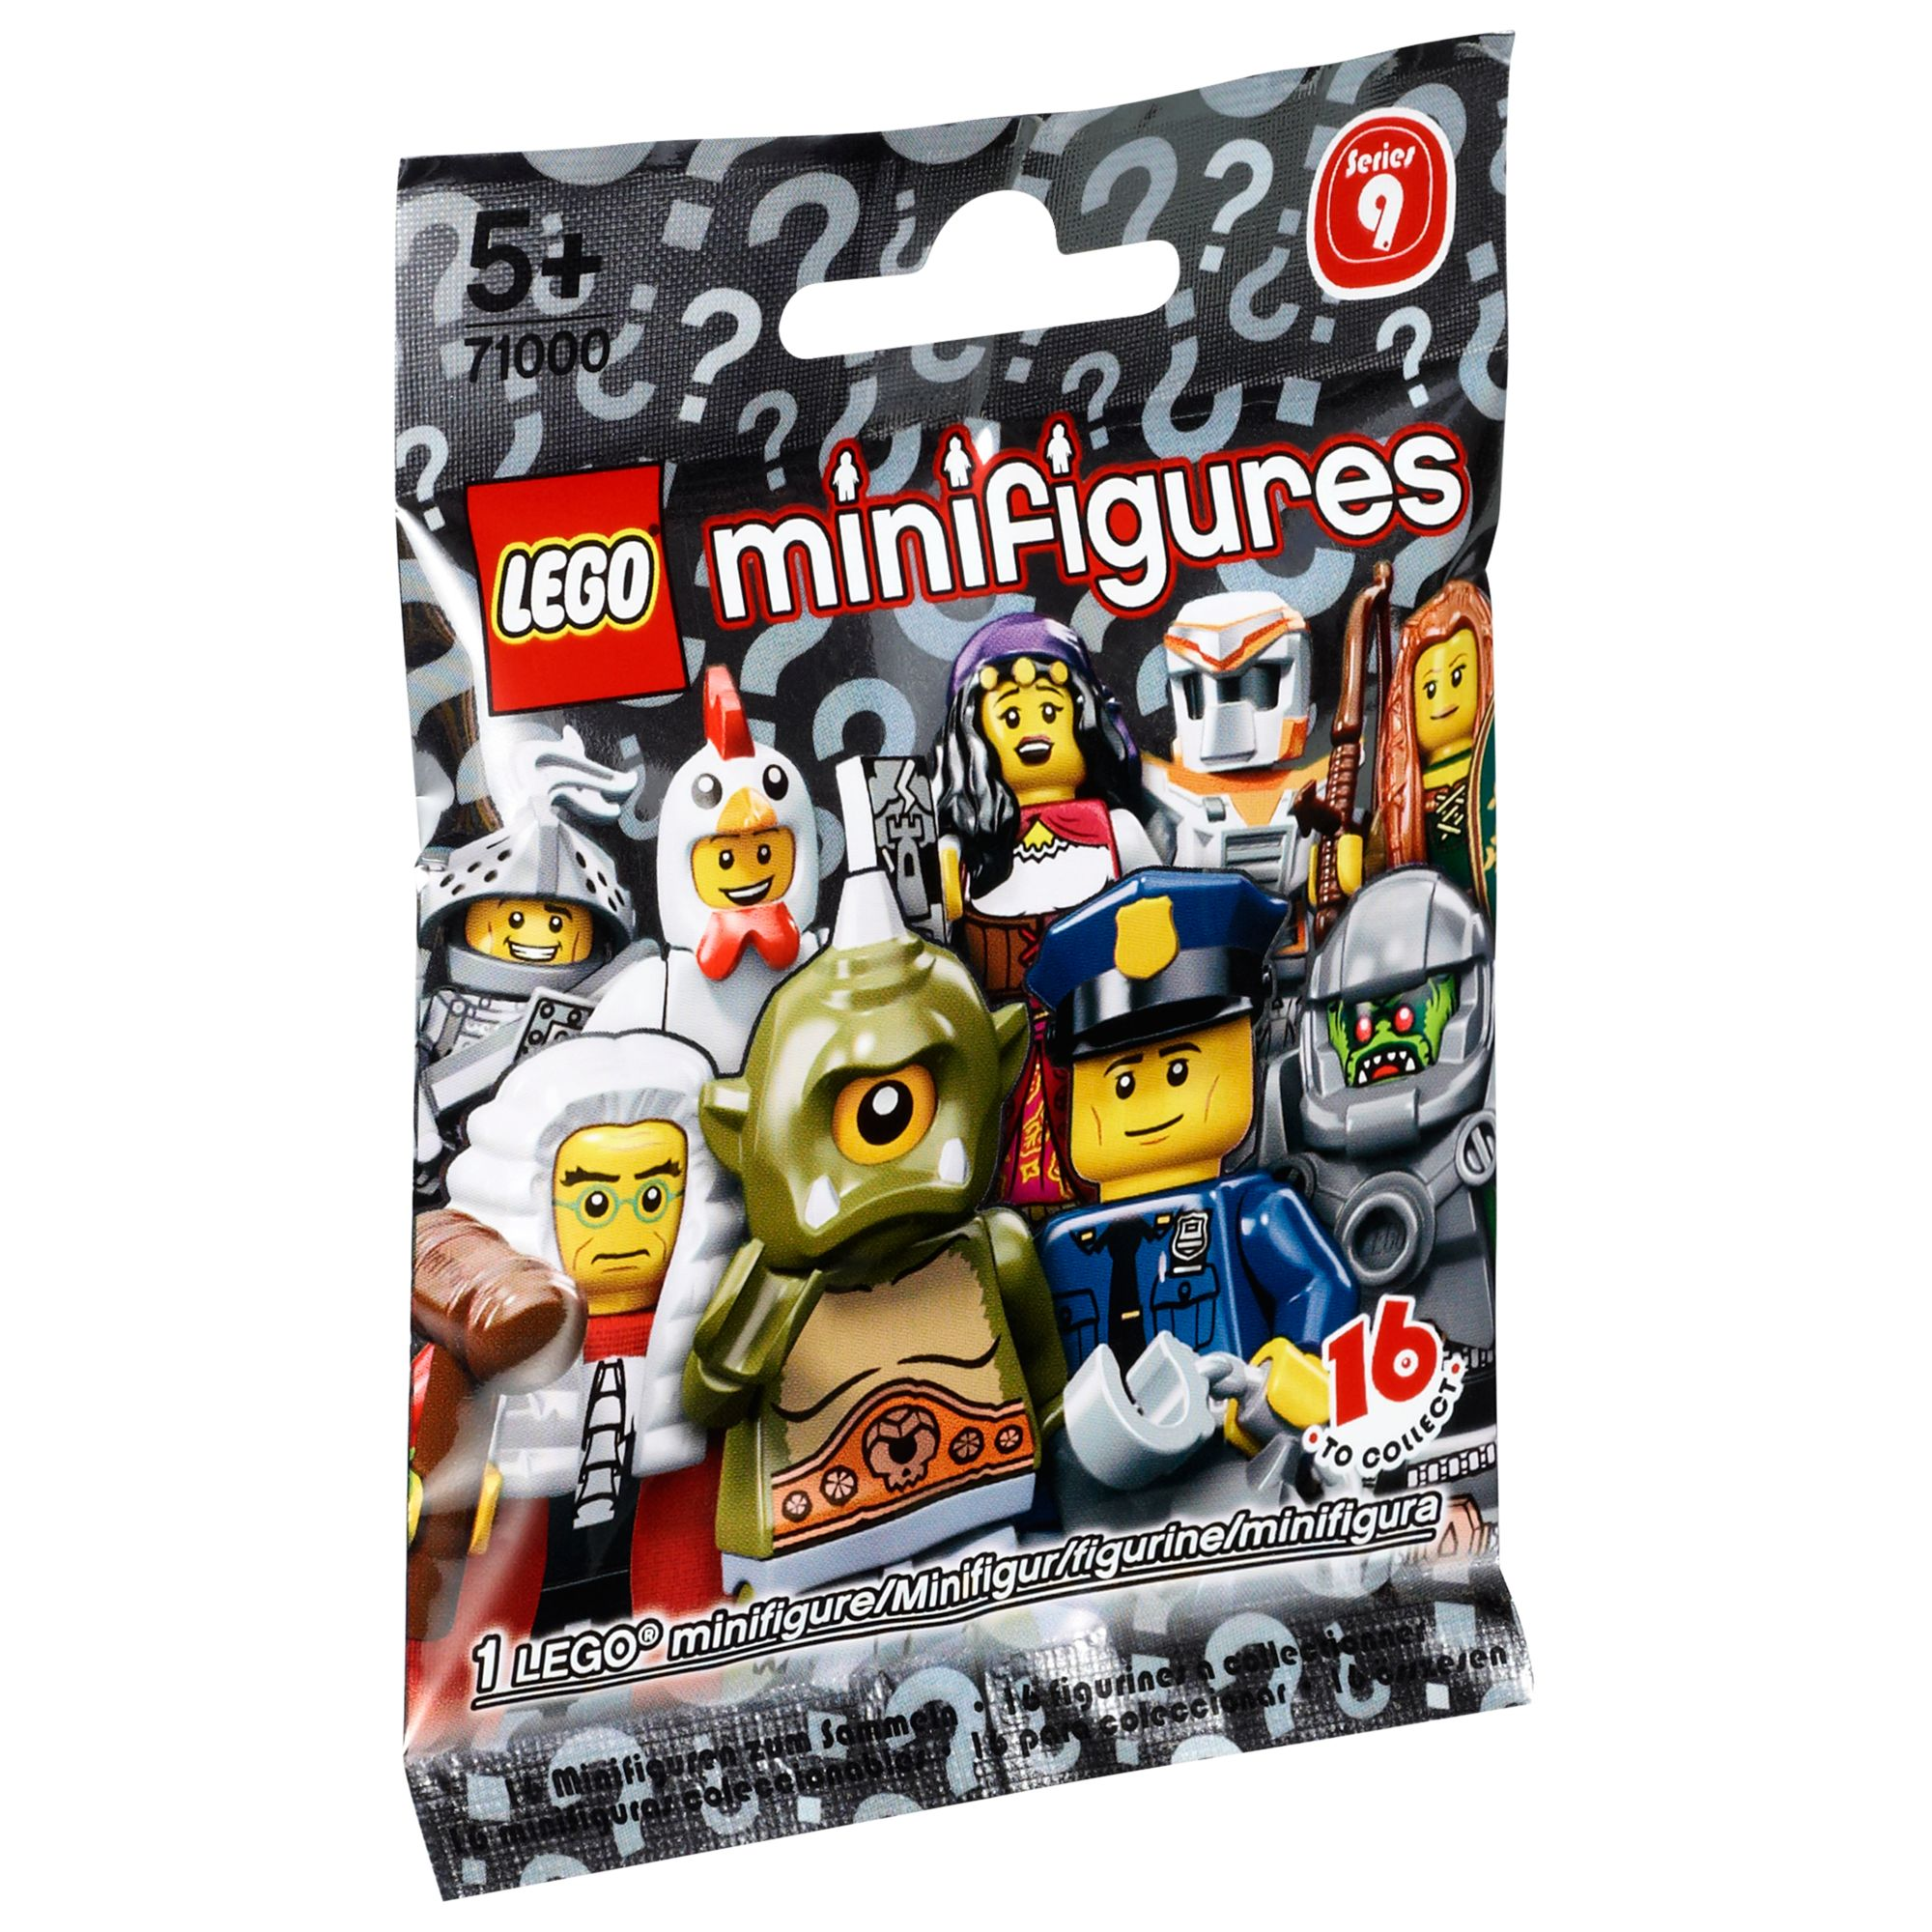 Lego Minifigures, Series 9, Assorted